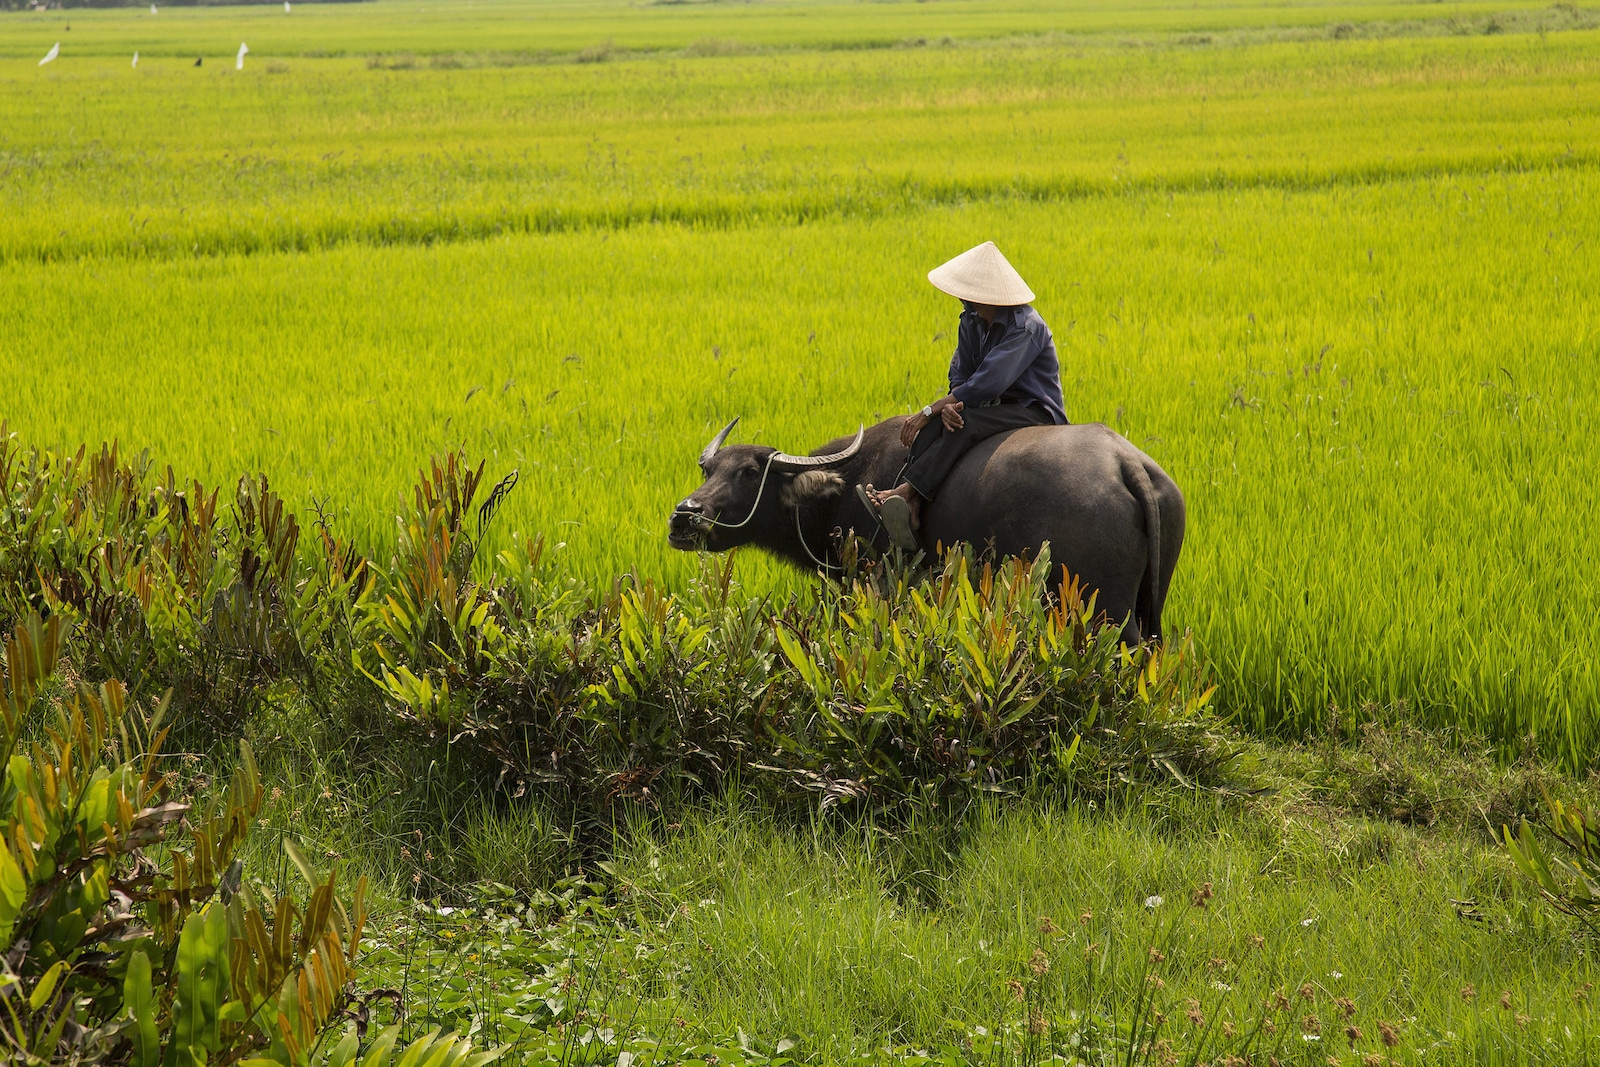 Water Buffalo and Farmer, Hoian